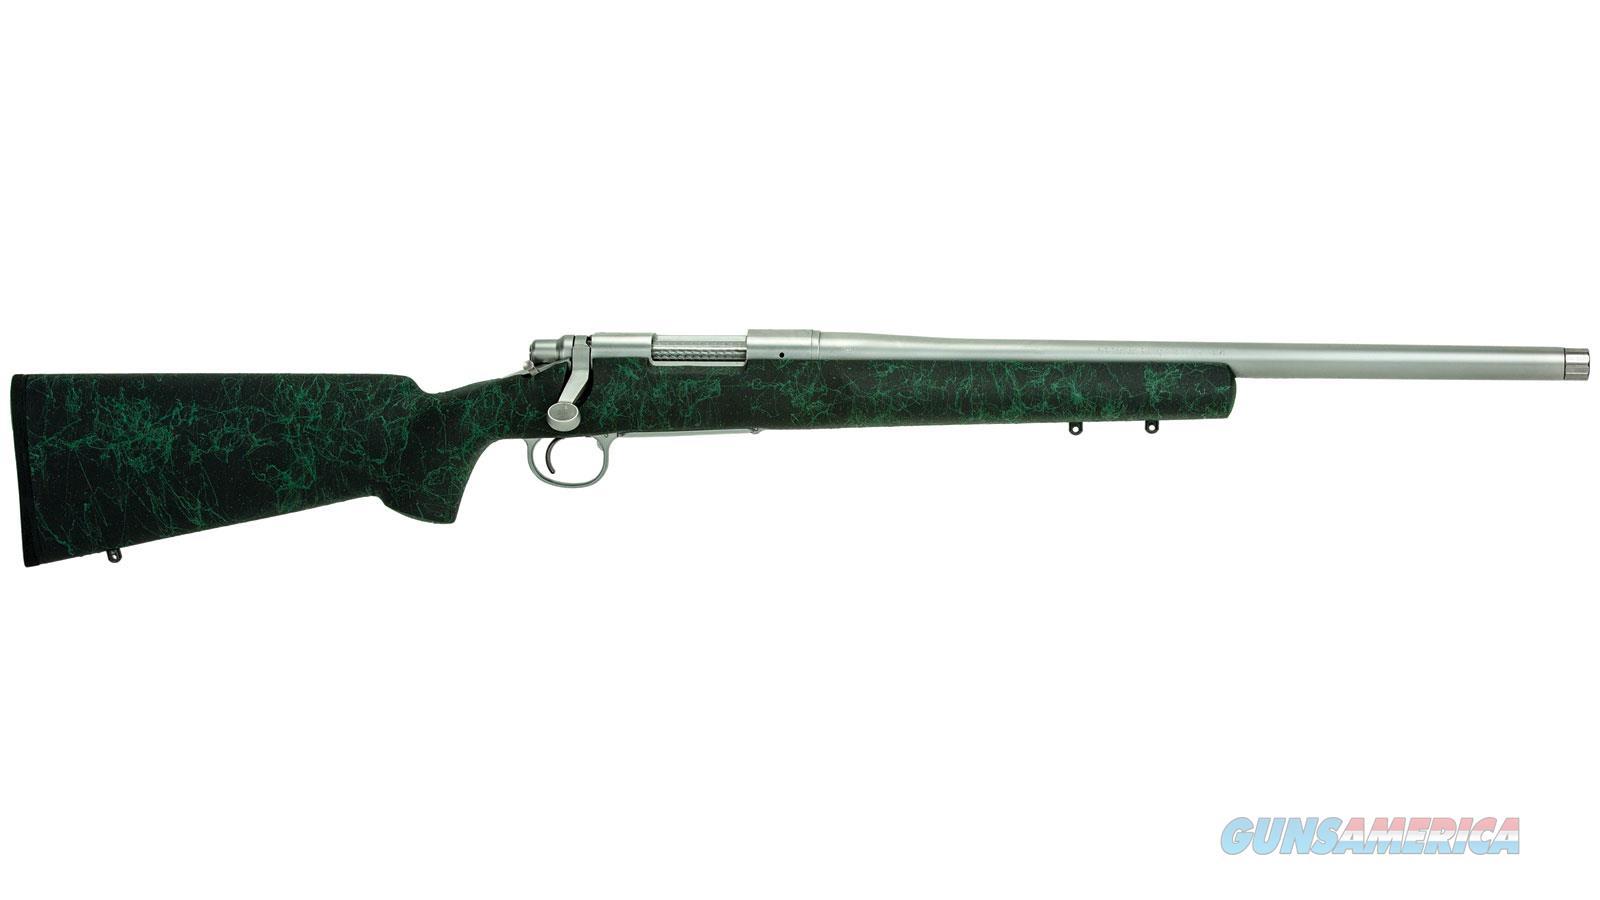 Remington 700 Ss 223Rem 20 Thread Fluted Hs Stk 5-R 85507  Guns > Rifles > R Misc Rifles